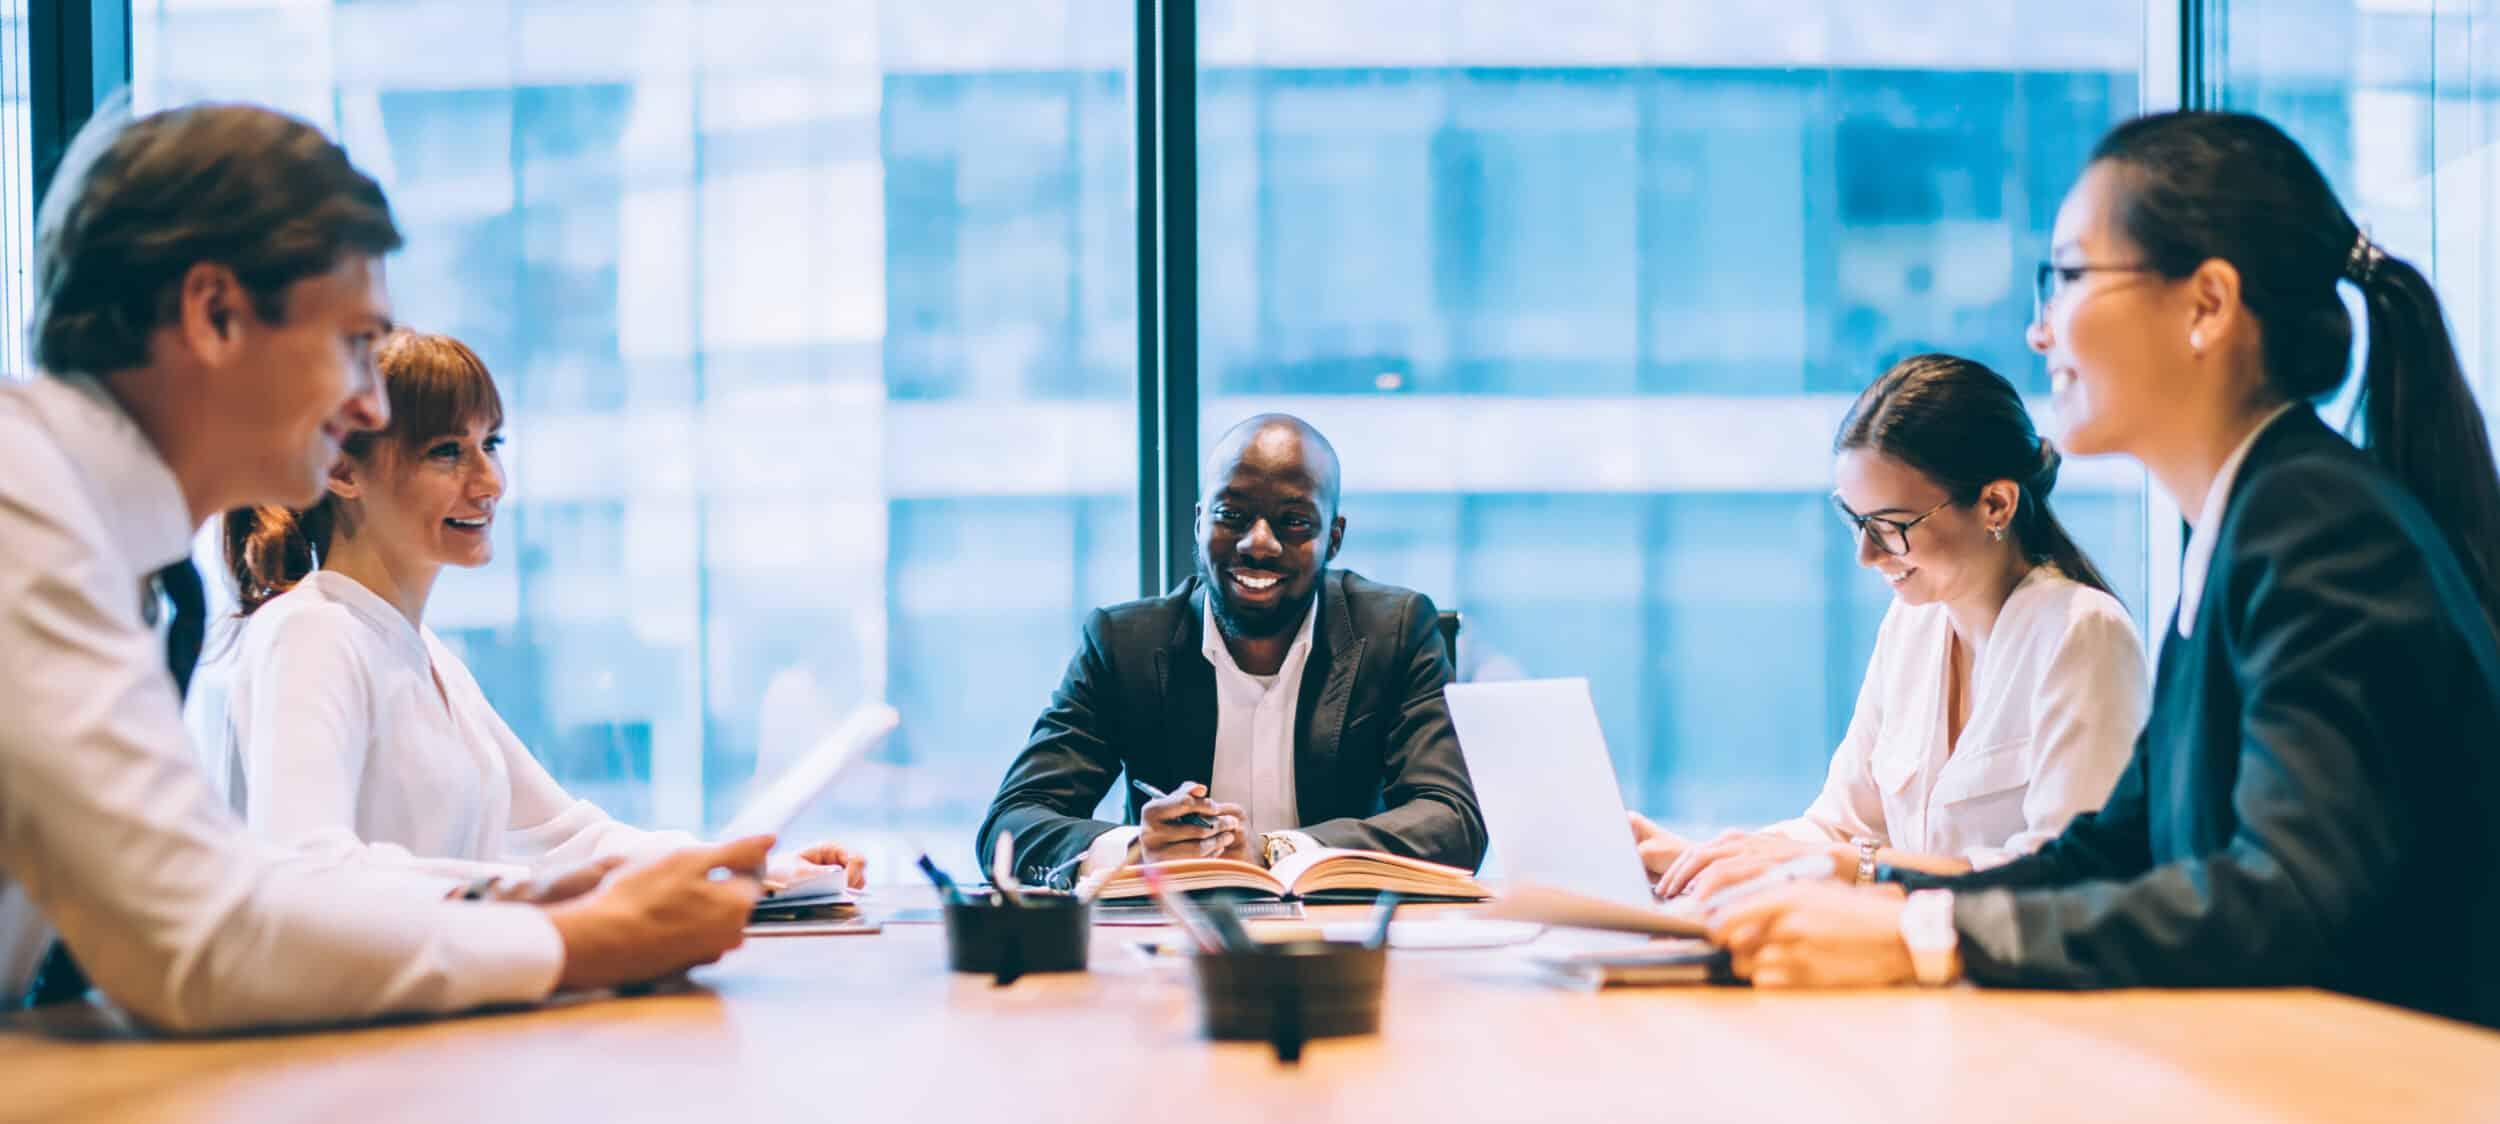 Healys LLP - Careers in Law